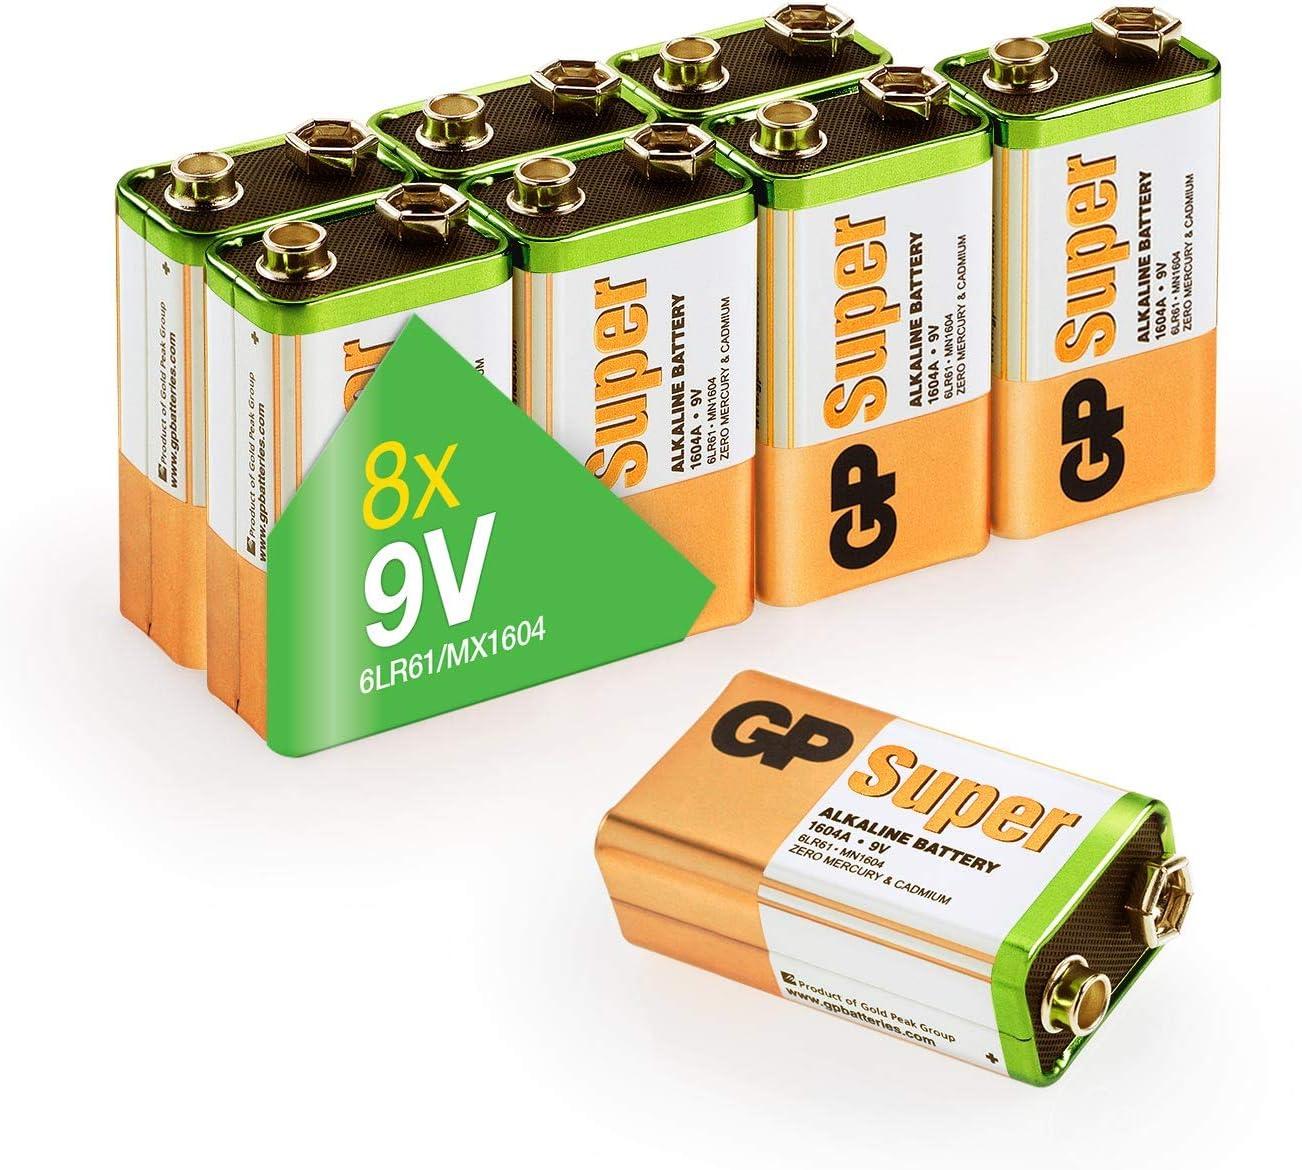 Gp 9v Block Batterien 9 Volt Block Super Alkaline 9v Elektronik